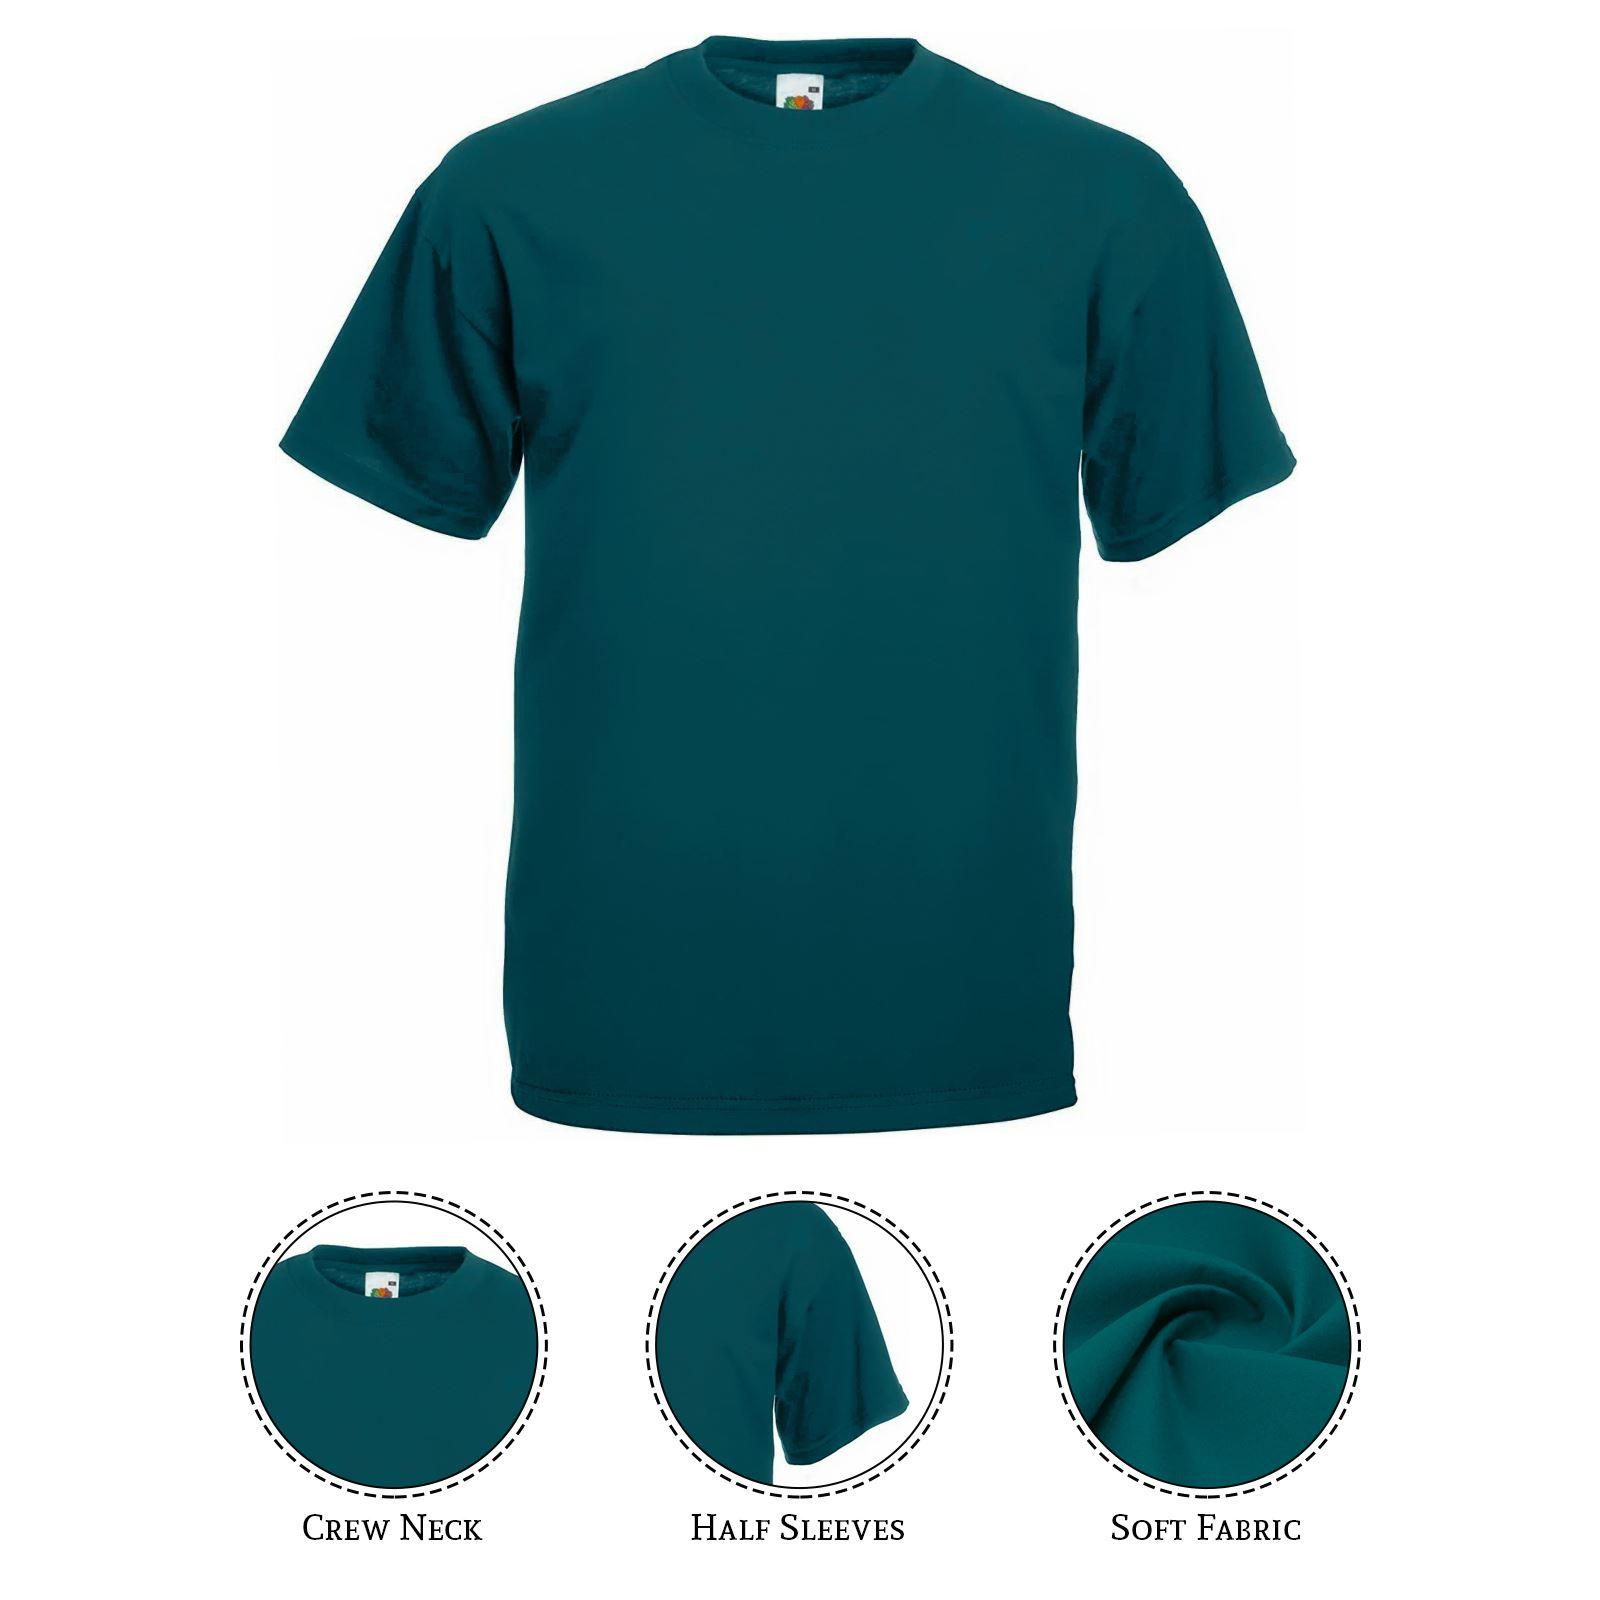 thumbnail 41 - Men-s-Fruit-Of-The-Loom-T-Shirt-Original-100-Cotton-Casual-Plain-Top-Tee